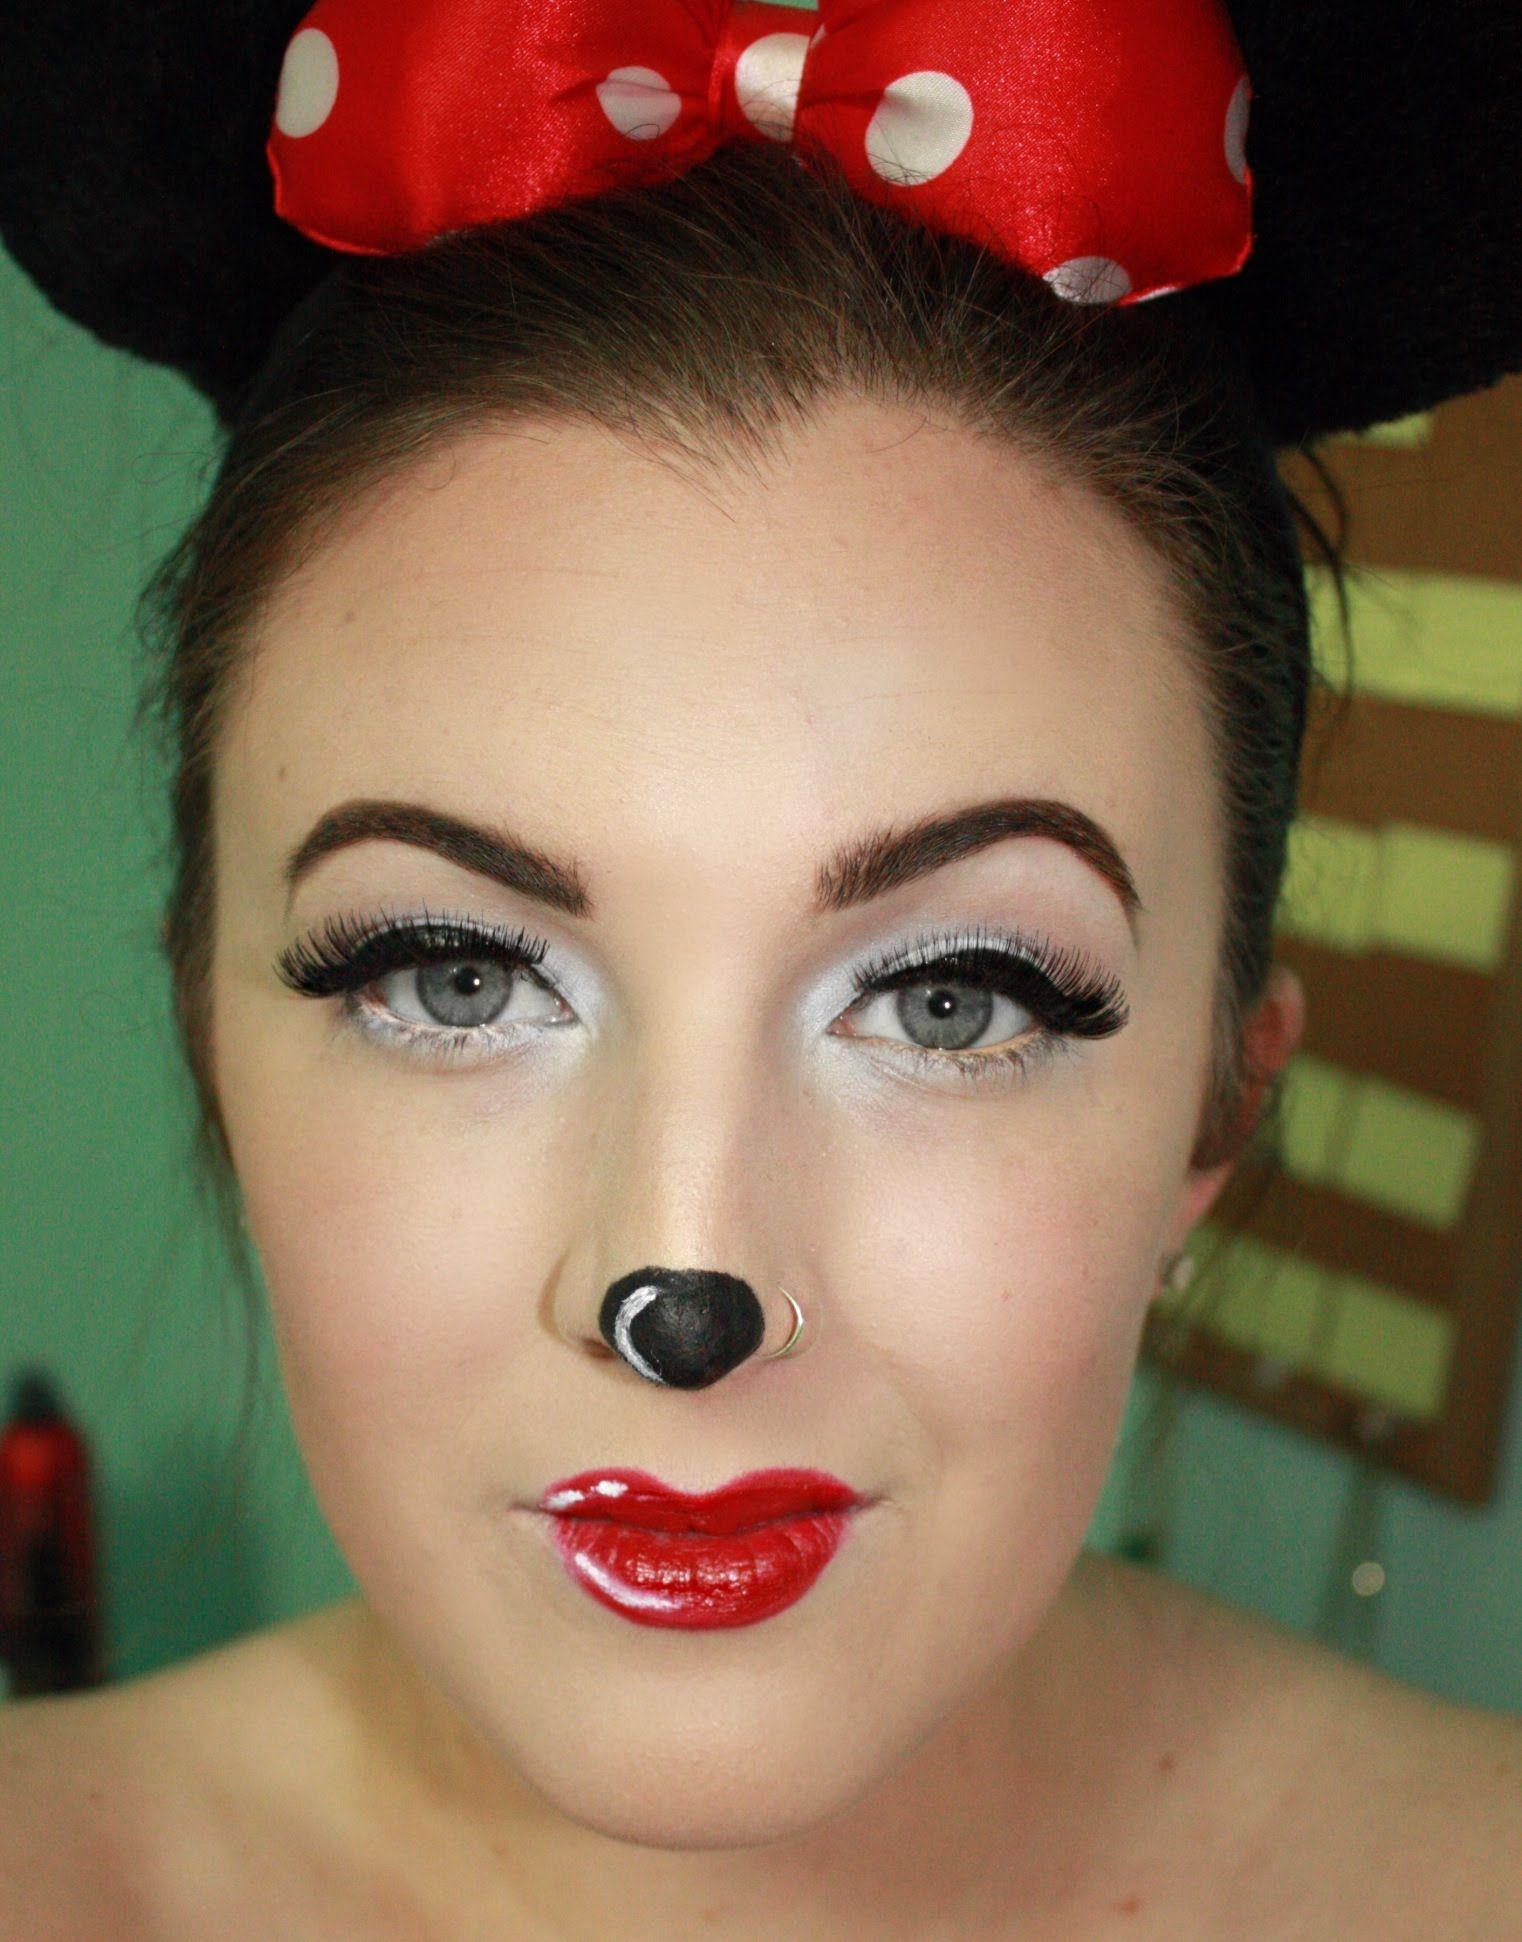 minnie mouse halloween makeup tutorial holidays pinterest. Black Bedroom Furniture Sets. Home Design Ideas